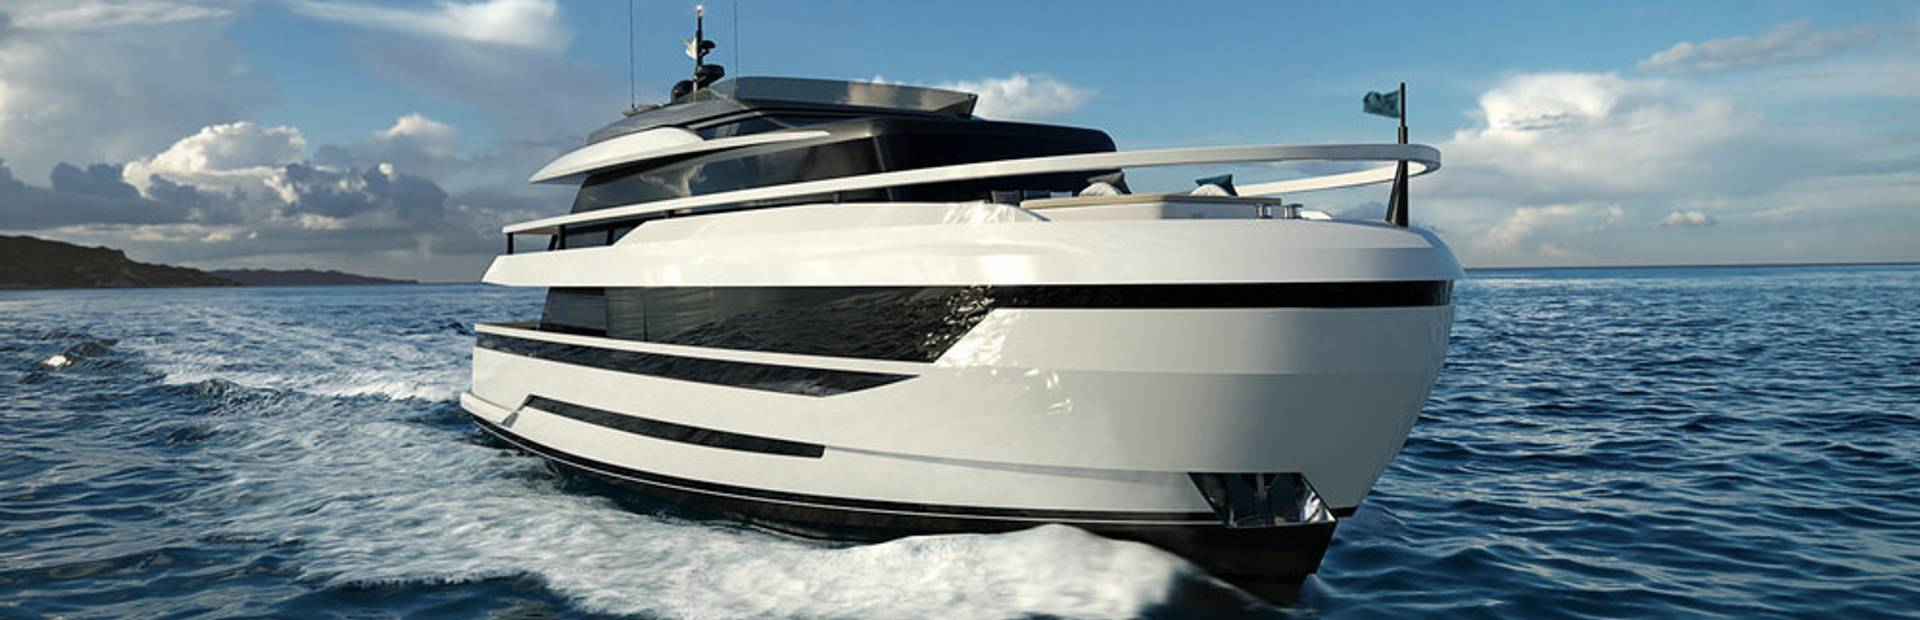 ISA Extra 93 Yacht Charter